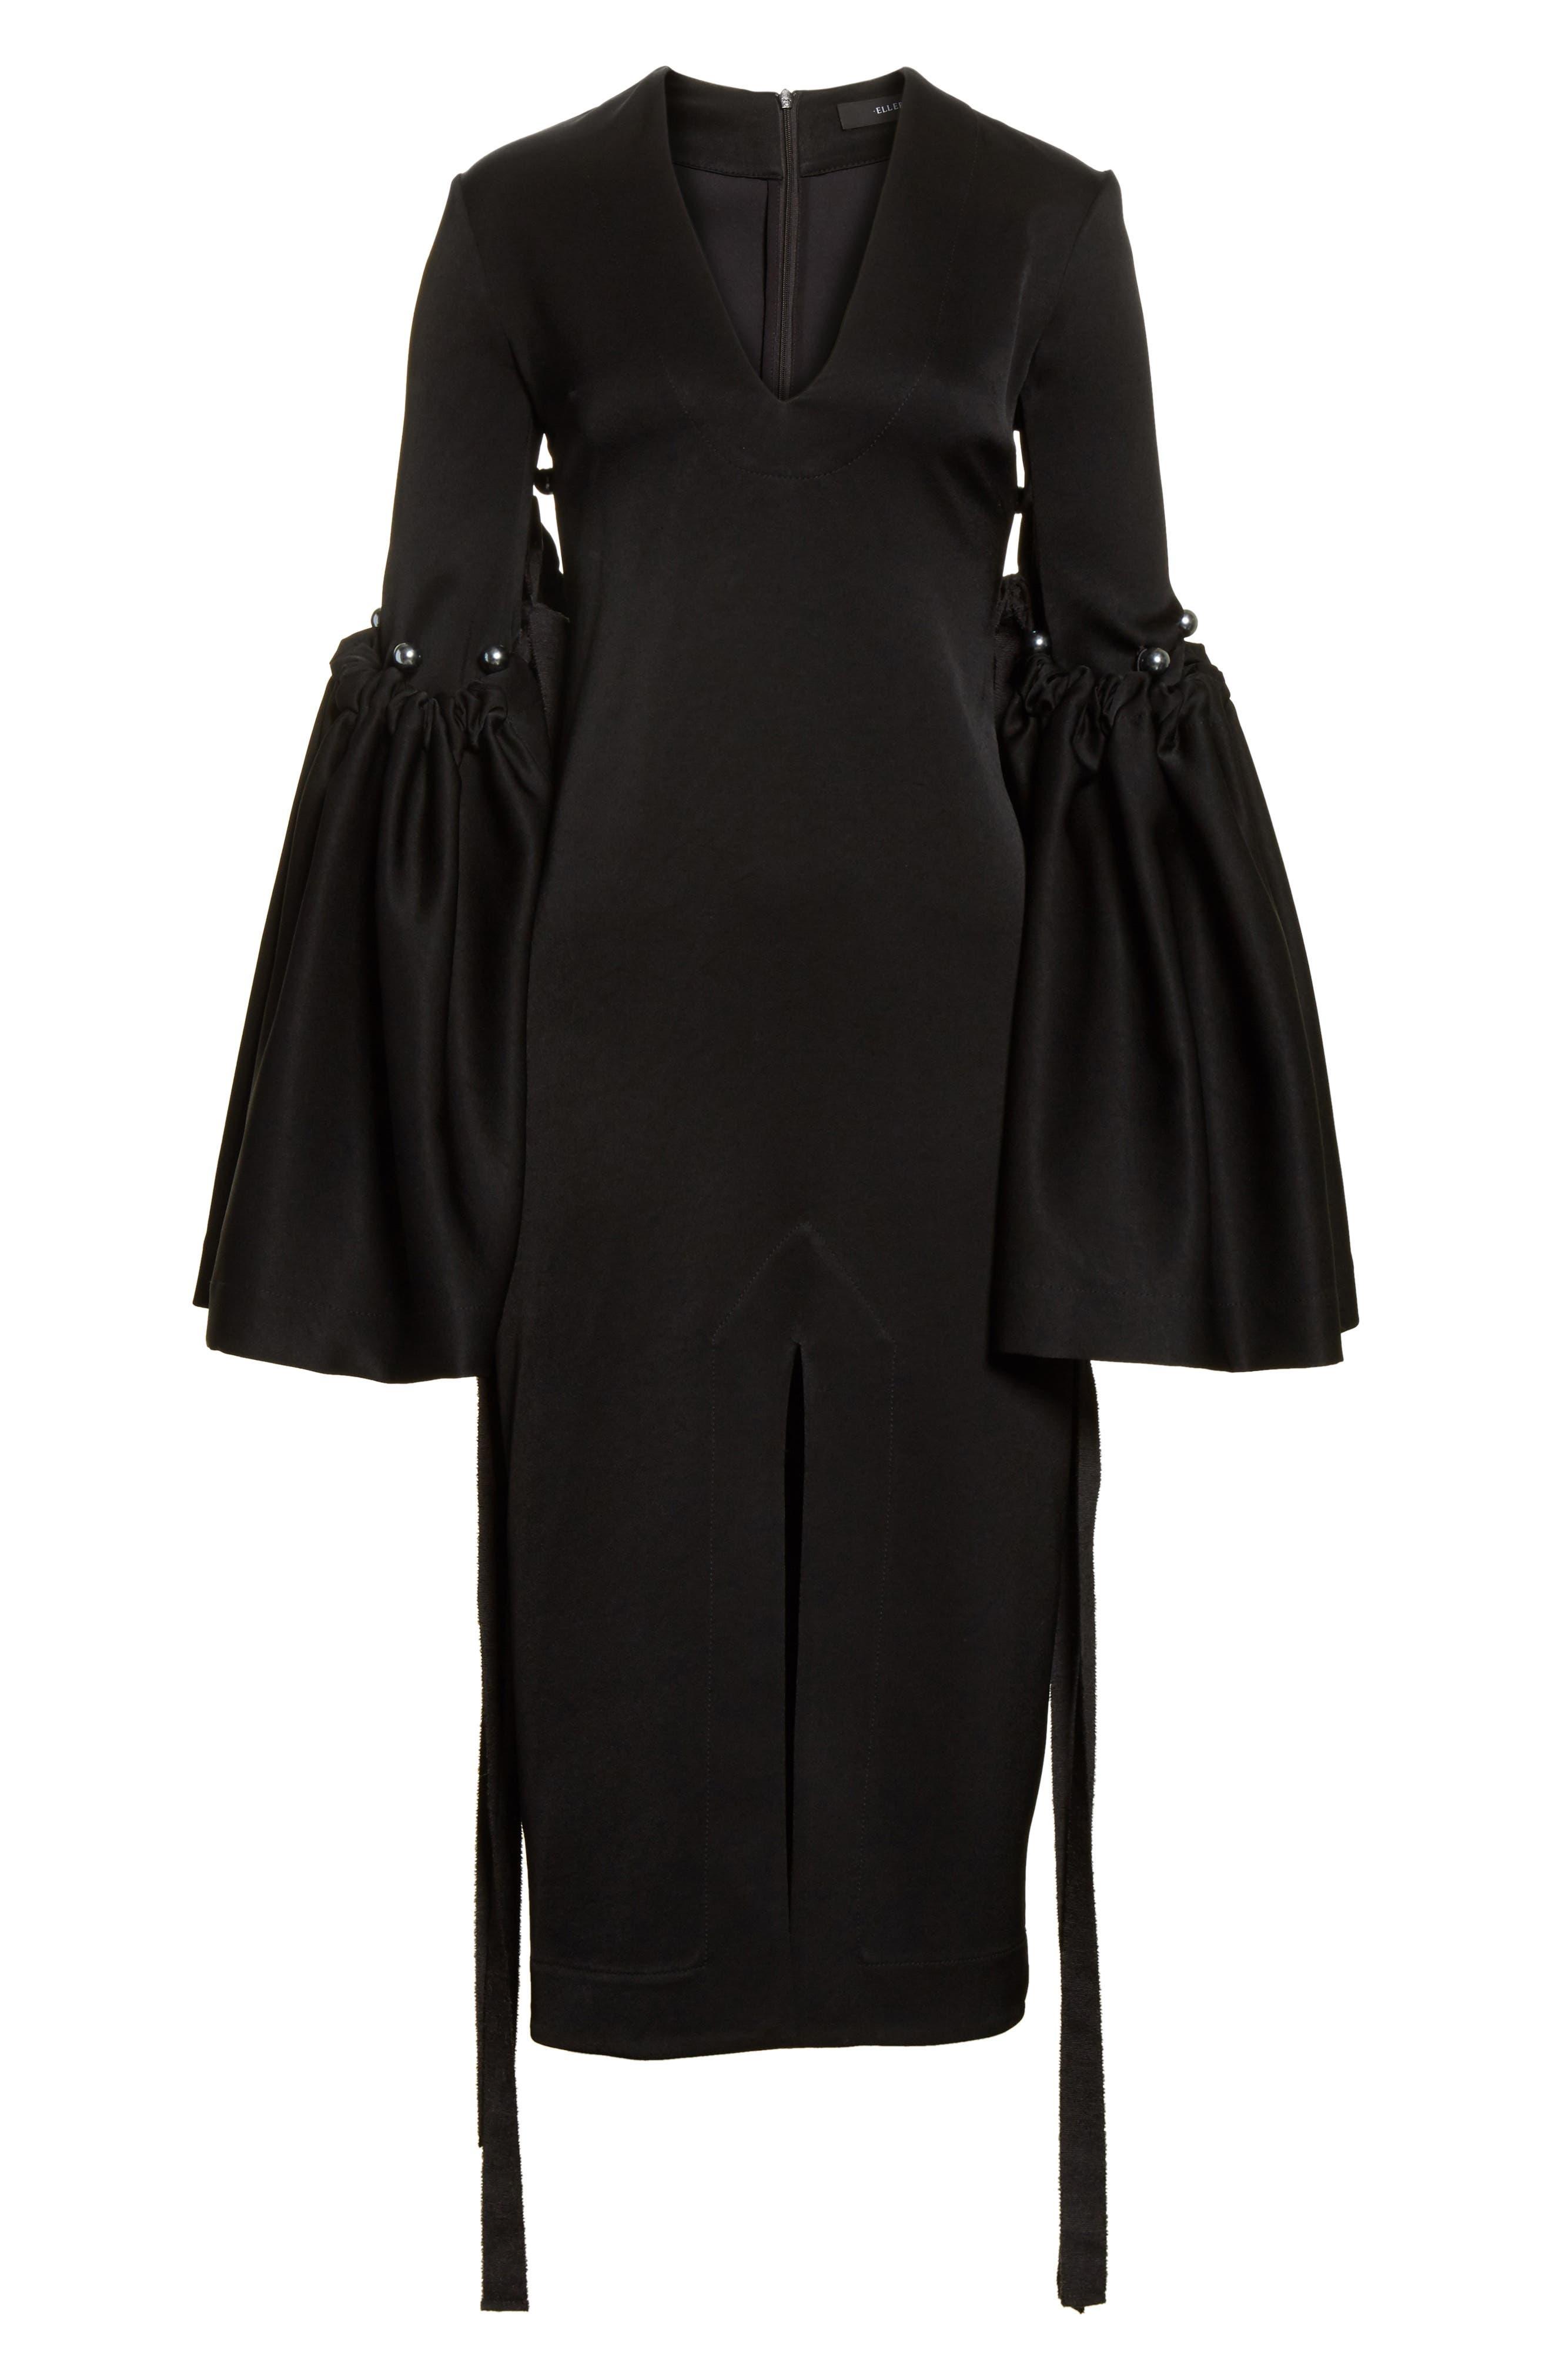 Adage Detachable Bell Sleeve Dress,                             Alternate thumbnail 6, color,                             001